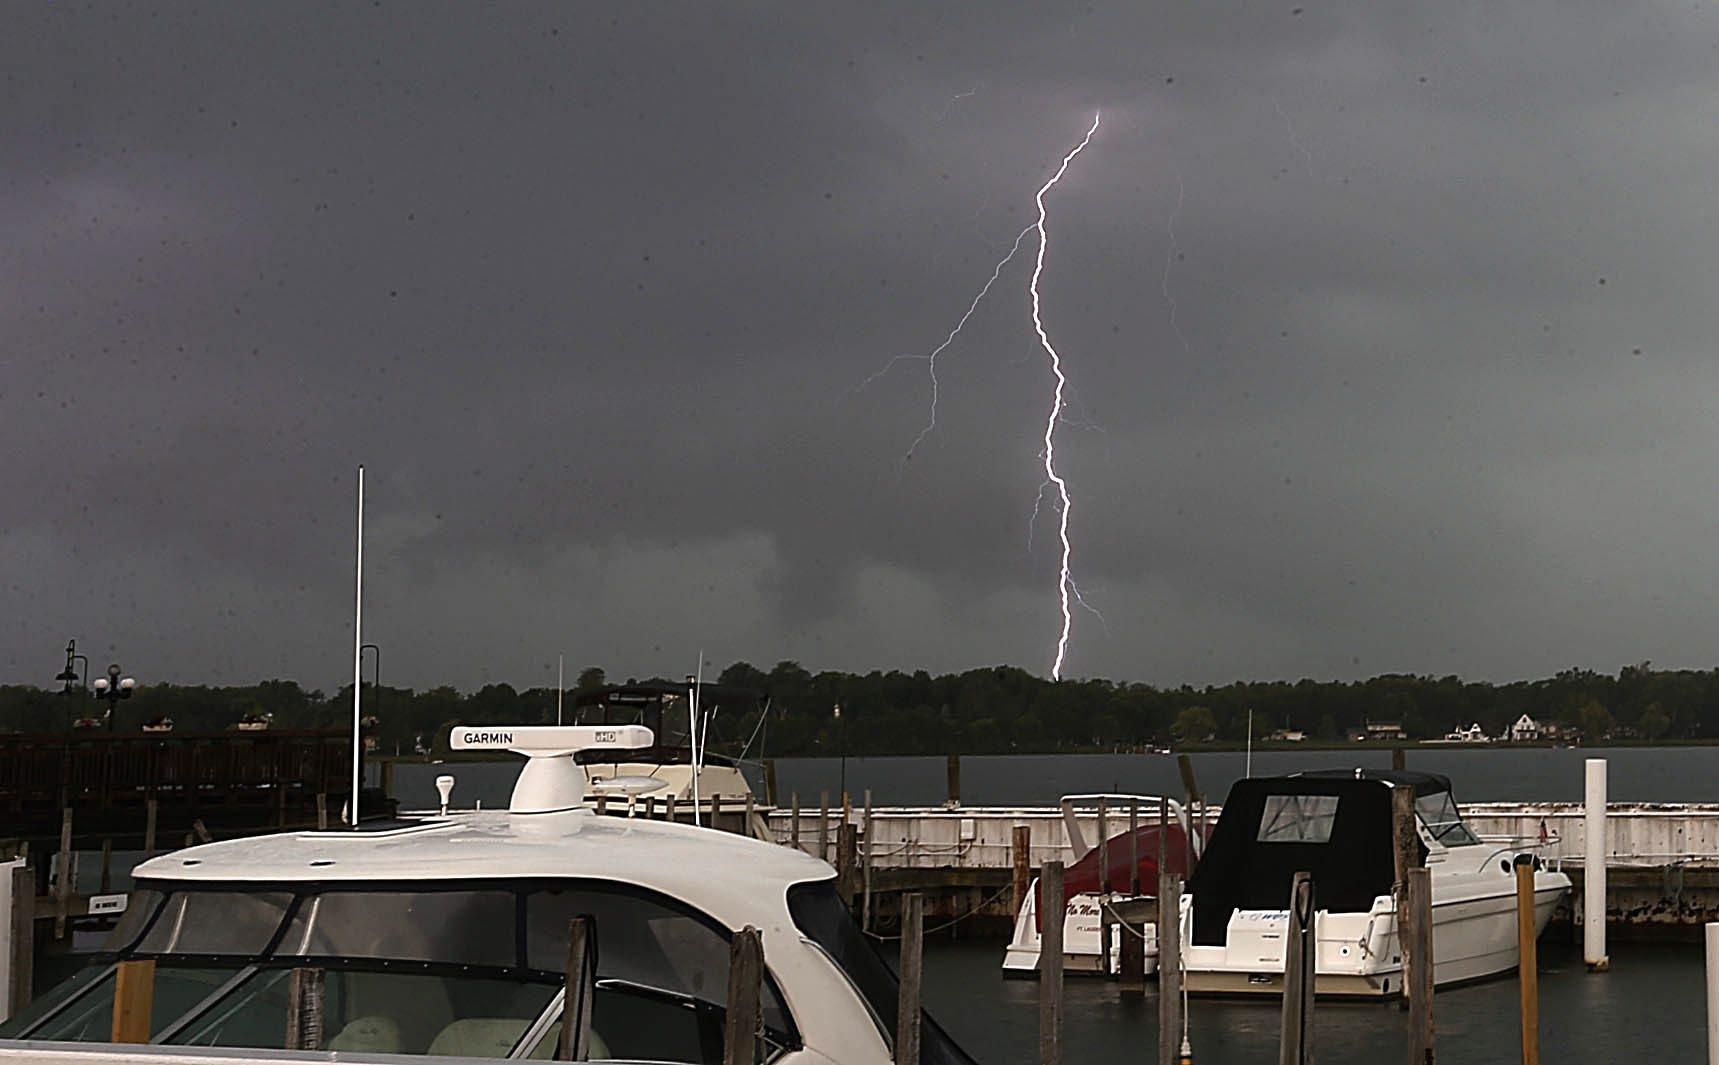 Bolts of lightning are displayed over the Niagara River near Acqua Restaurant on Niagara Street in Buffalo during the storm on Tuesday.  (Robert Kirkham/Buffalo News)